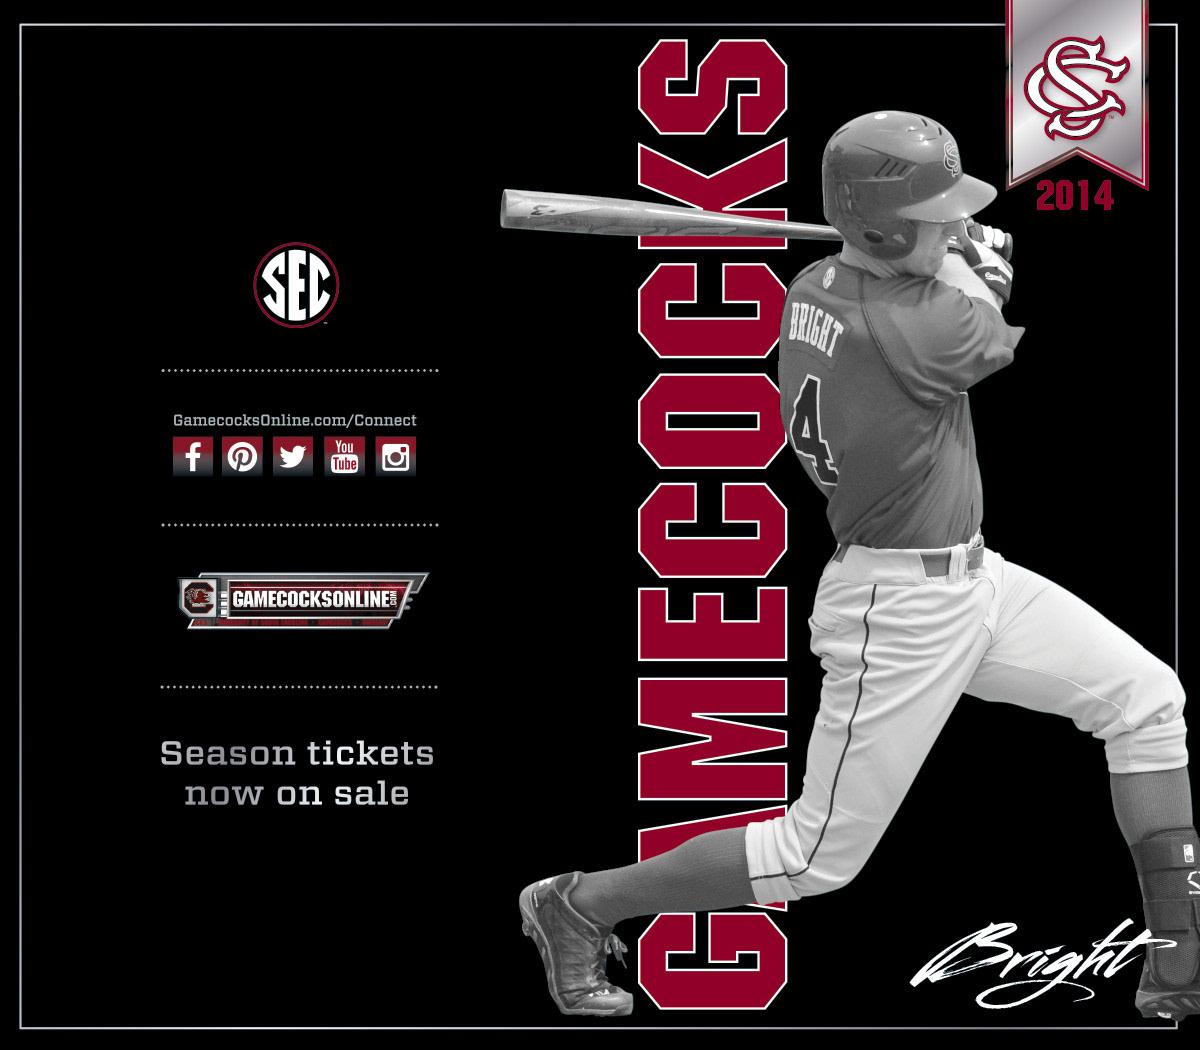 Black Barn University Of South Carolina Baseball Schedule